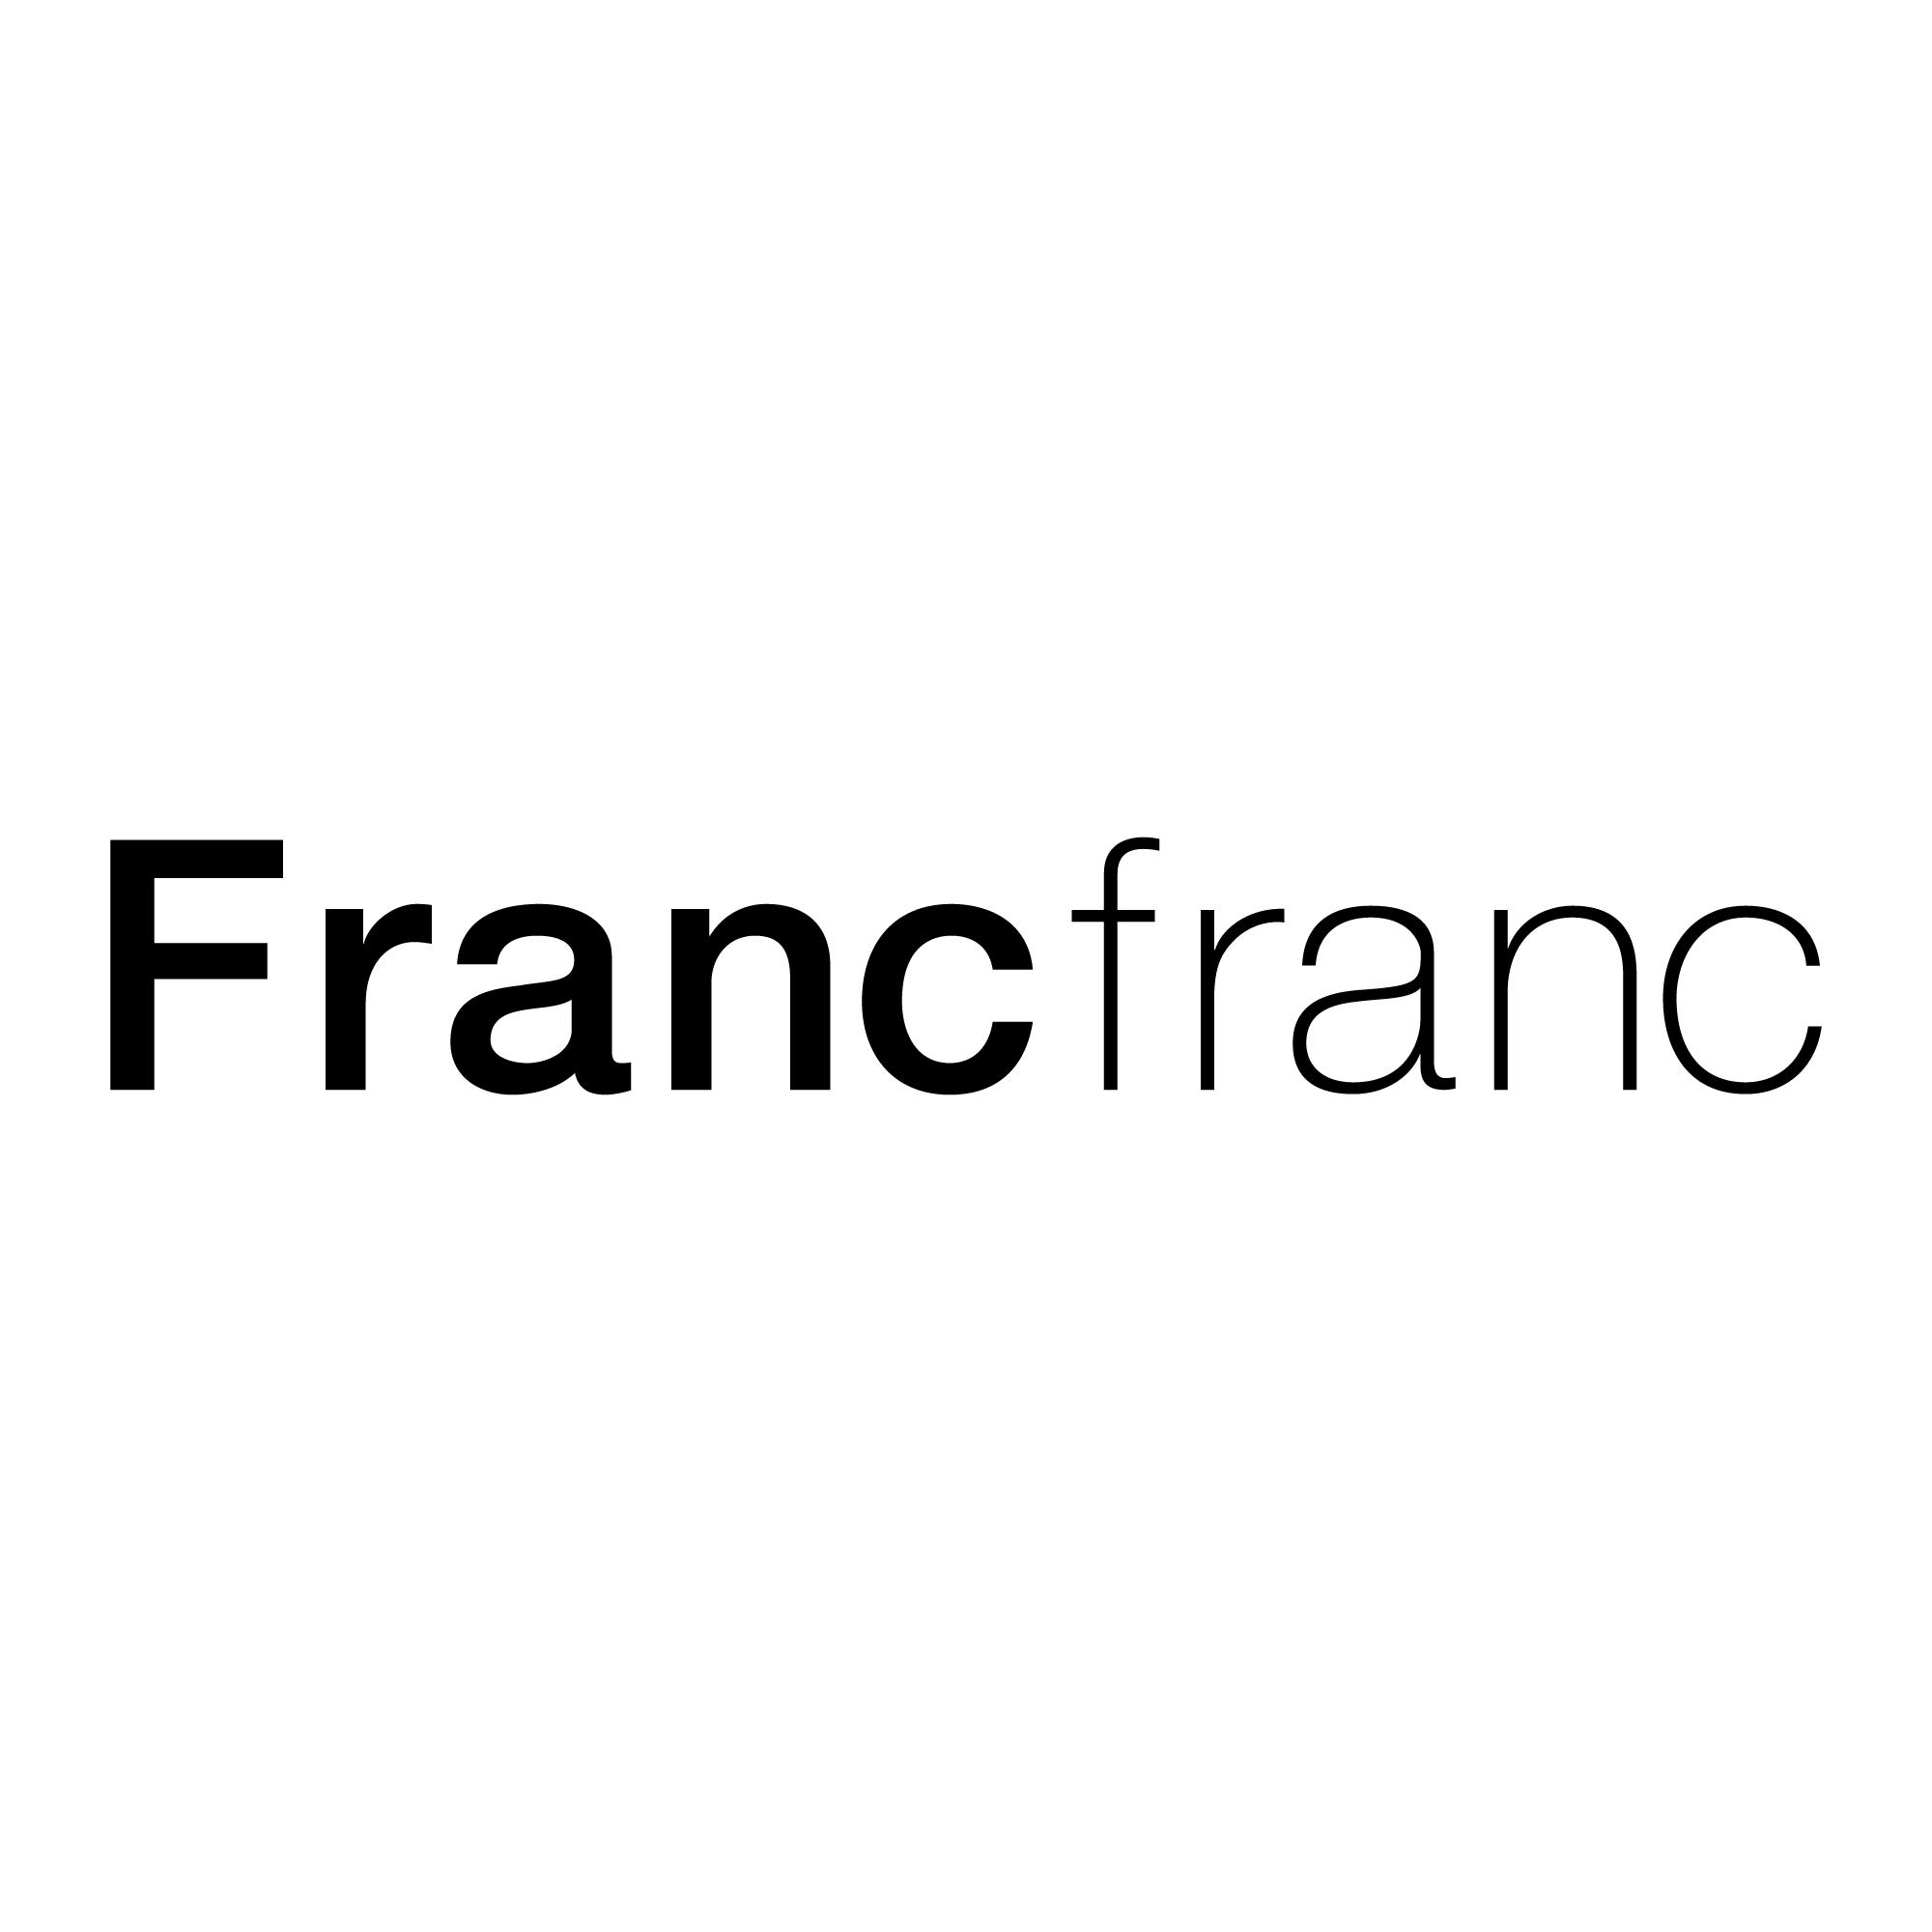 Francfranc (2021年10月1日至10月28日翻新工程暫停營業)